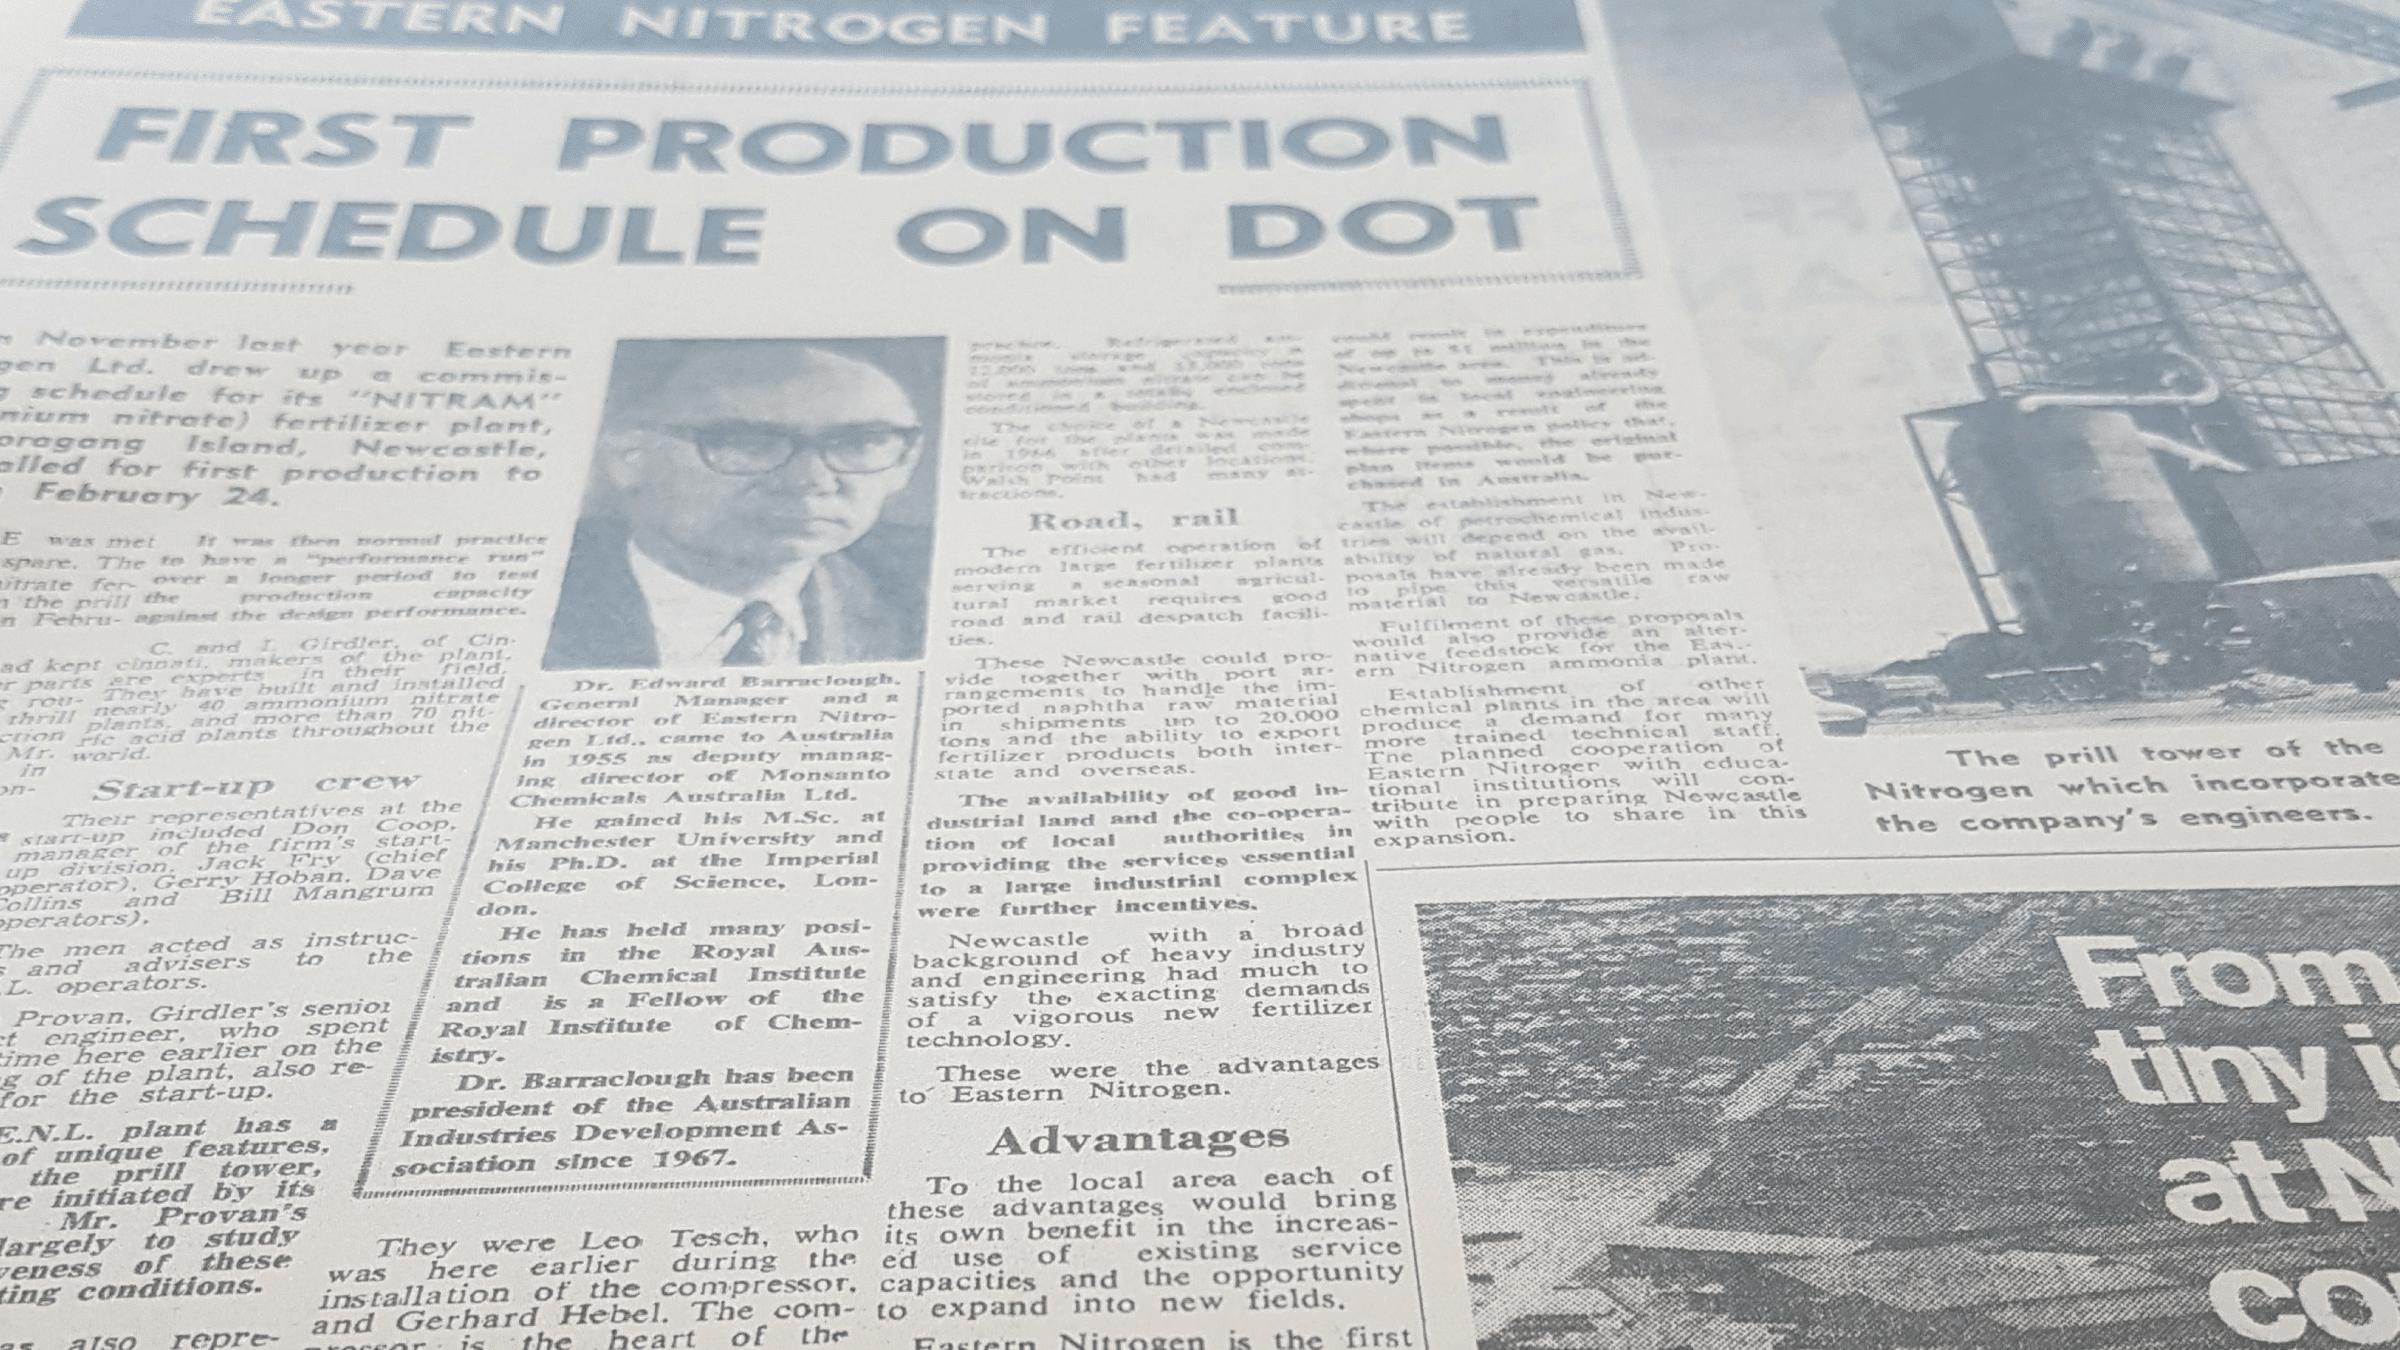 Kooragang Island: Celebrating 50 Years of Operation